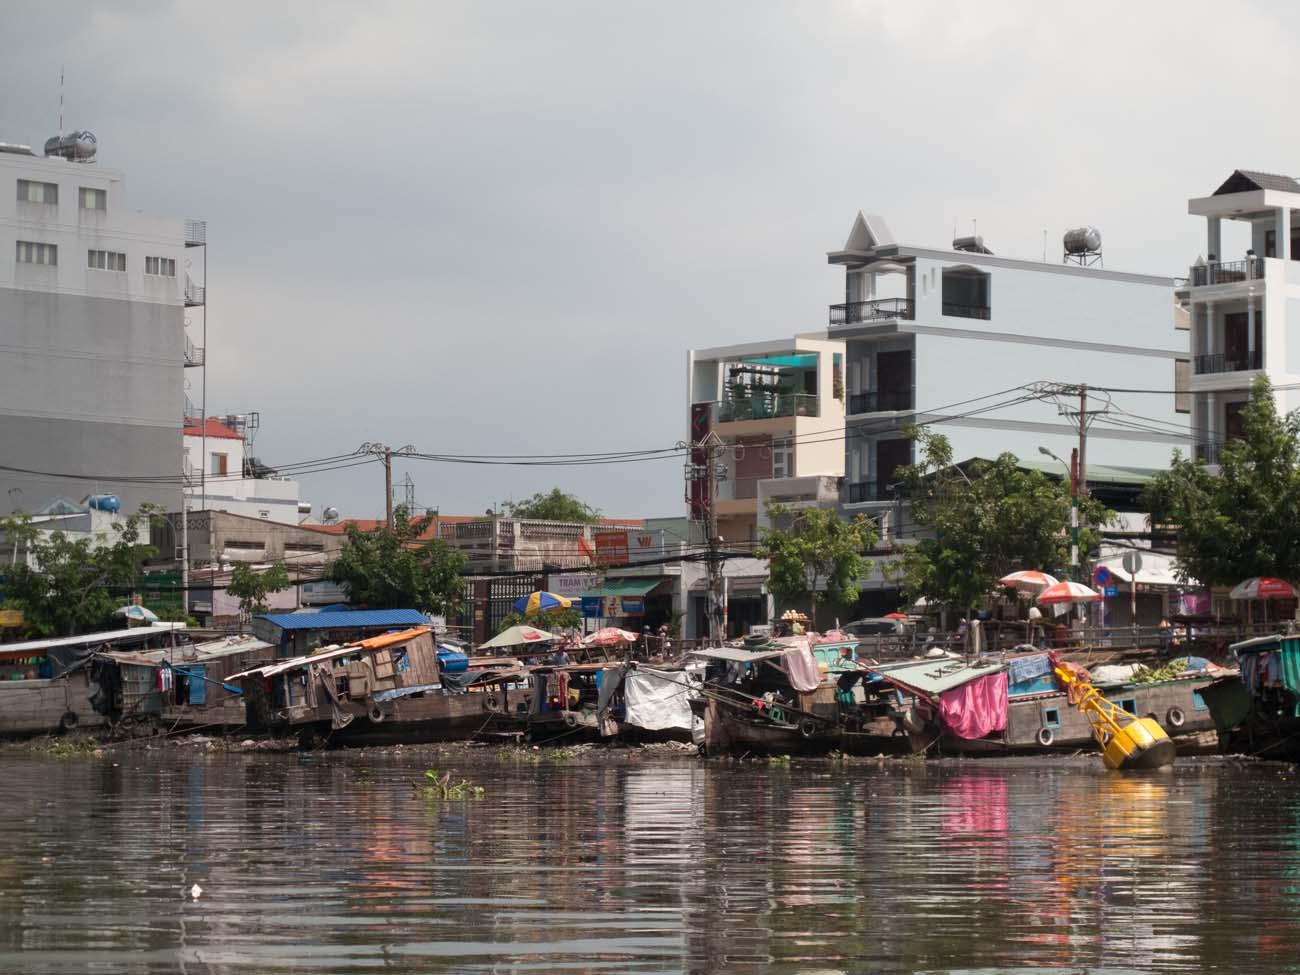 Boat tour, Saigon